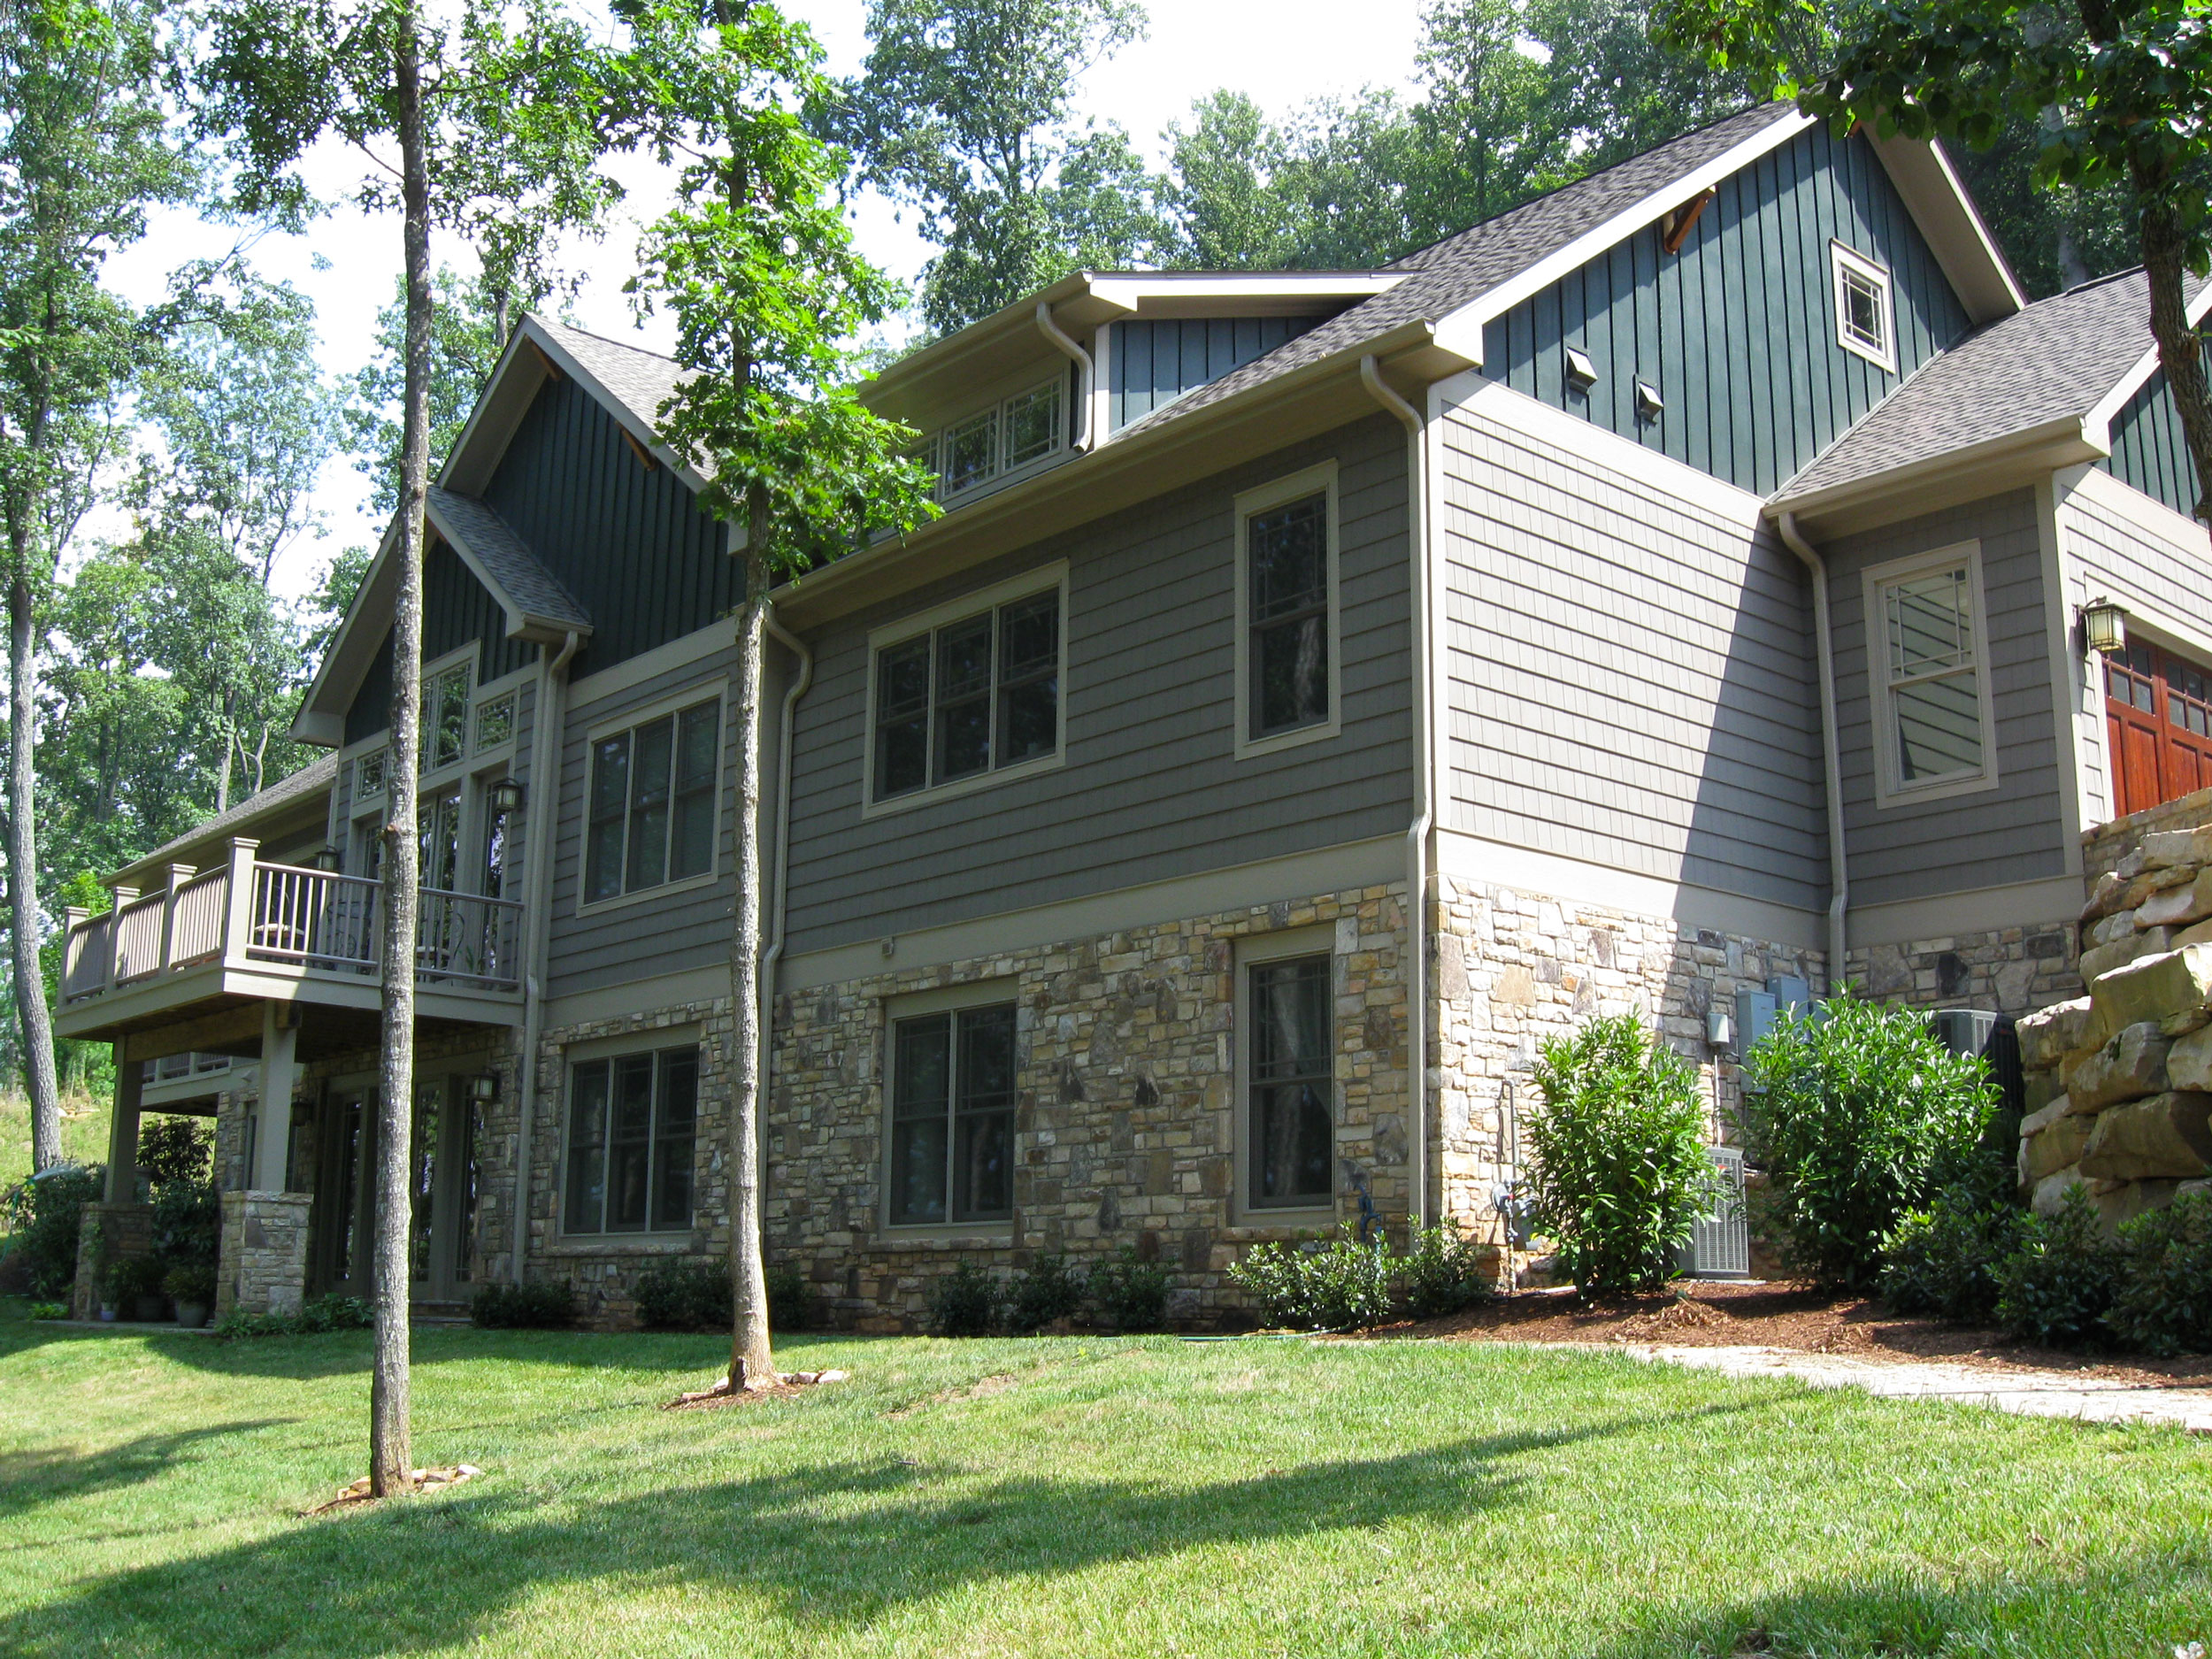 asheville-craftsman-dream-home-back-exterior.jpg